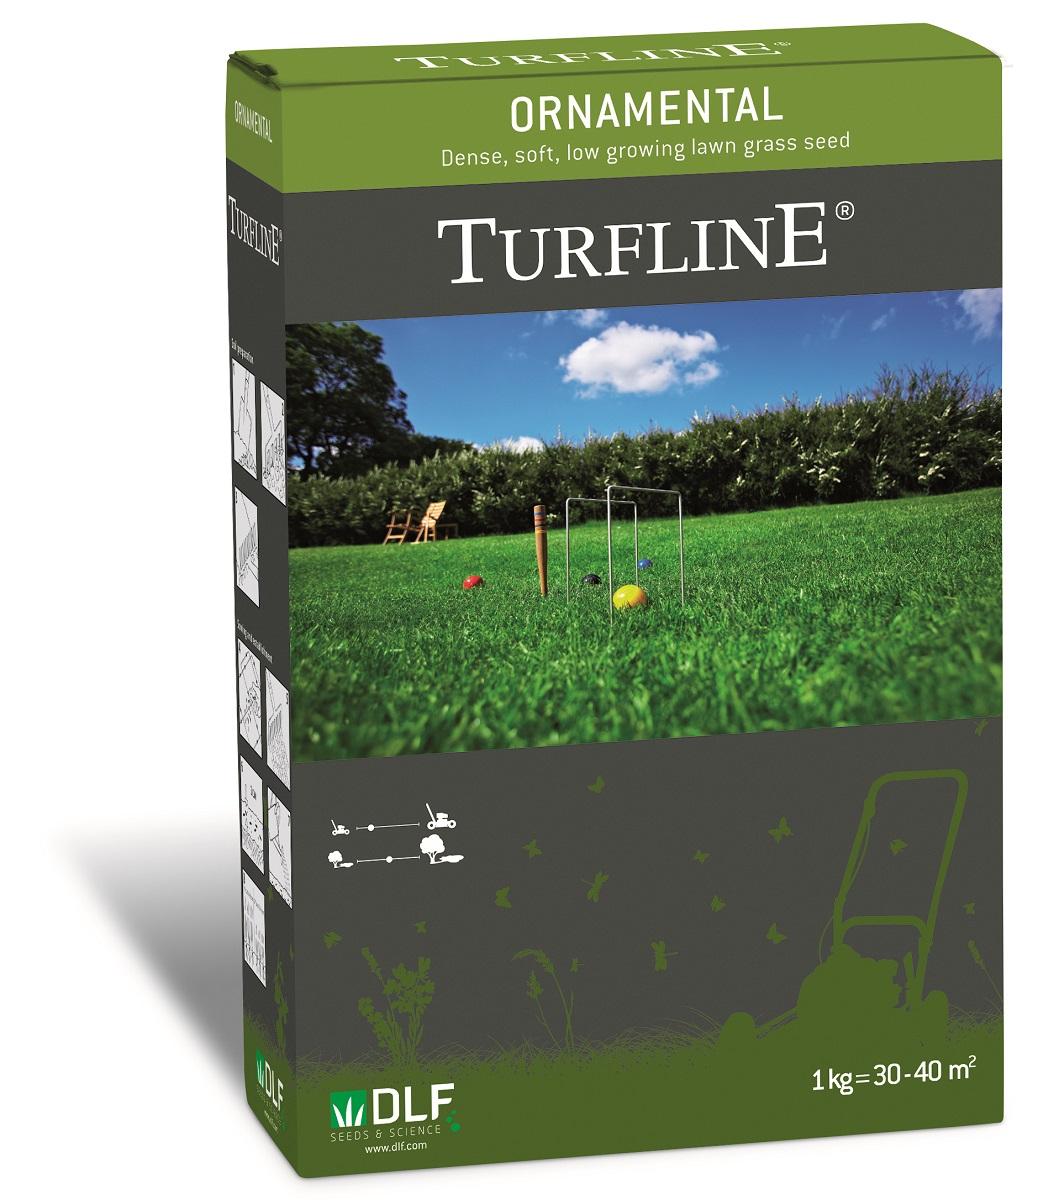 все цены на Семена Turfline газон DLF ORNAMENTAL 1 кг онлайн